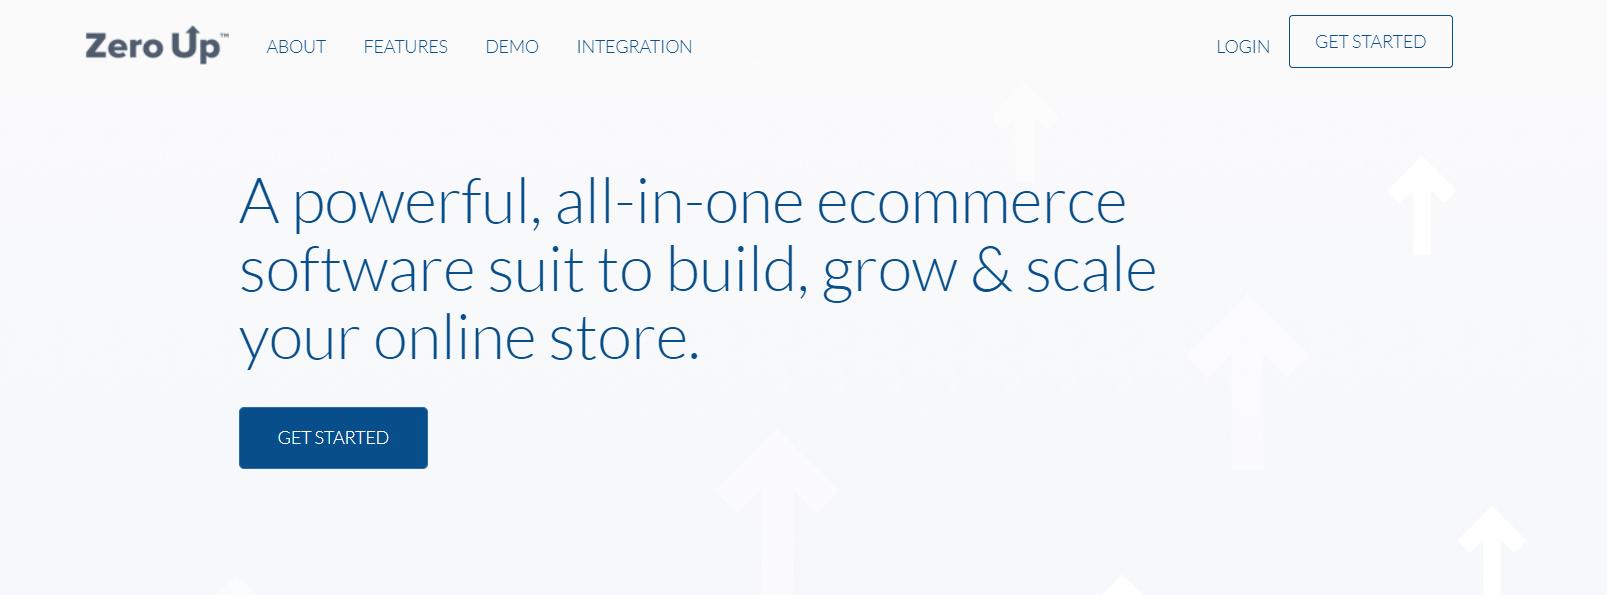 Zero Up™ Advanced eCommerce Technology- ZeroUp Review